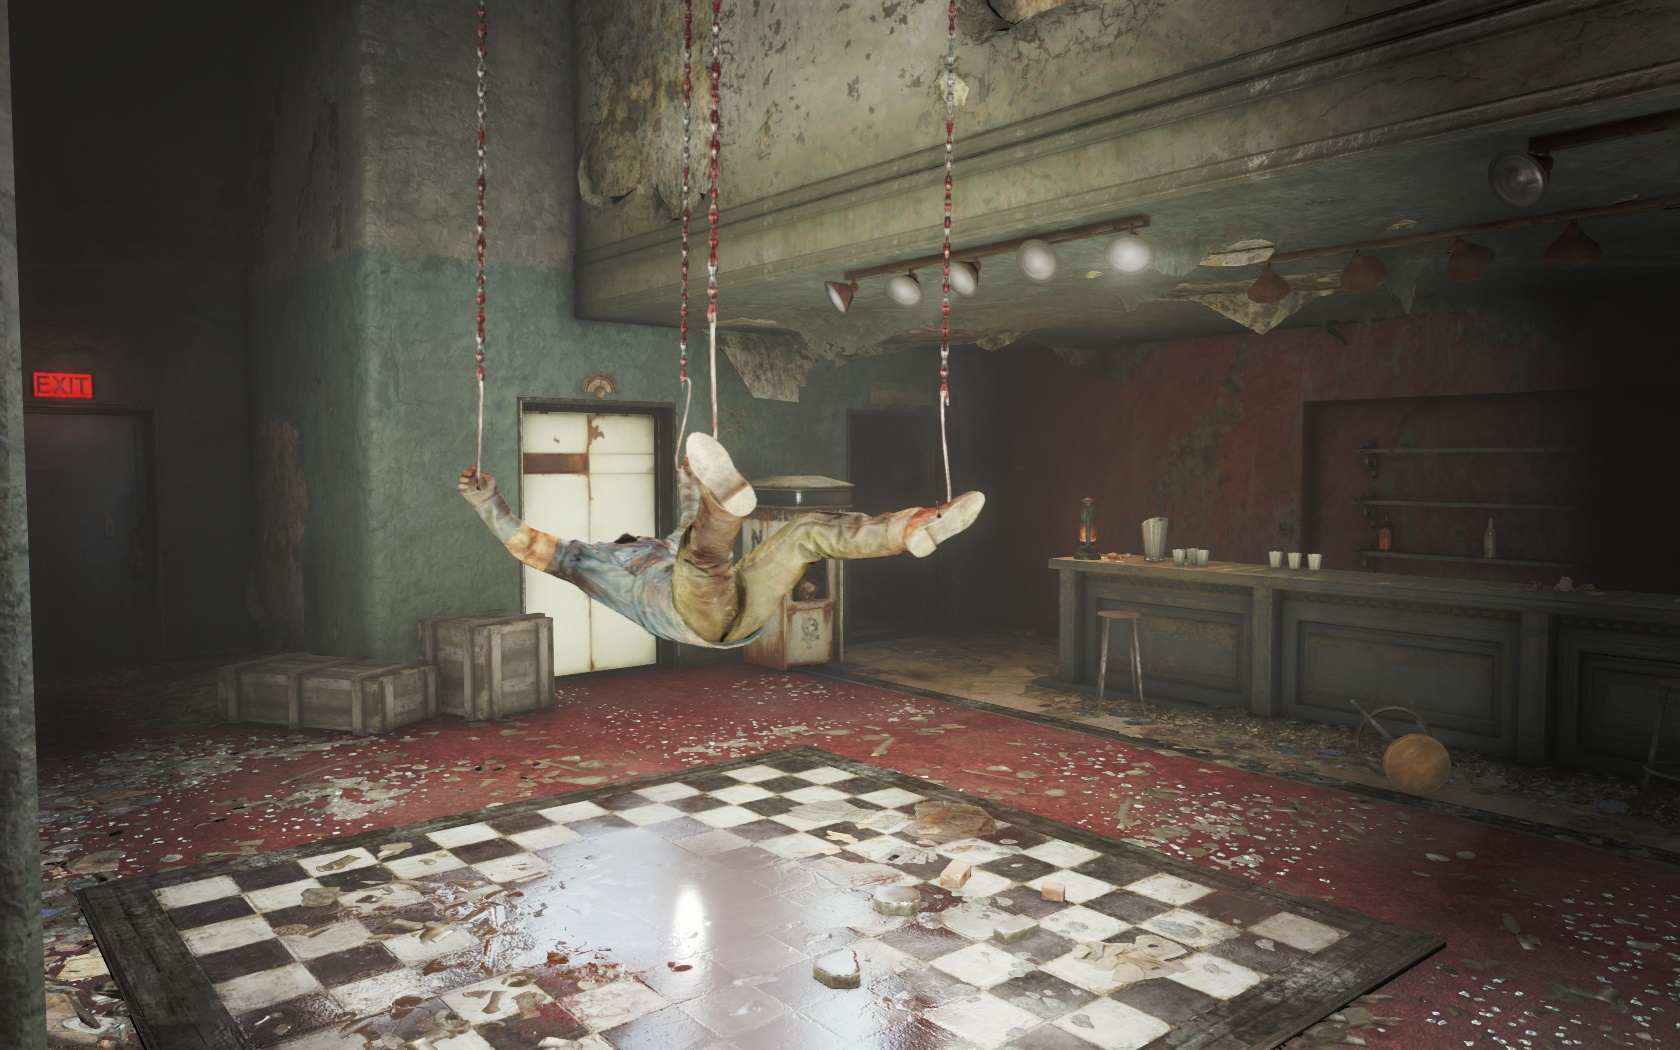 Декор (Бар Парквью) - Fallout 4 Бар, Бар Парквью, Парквью